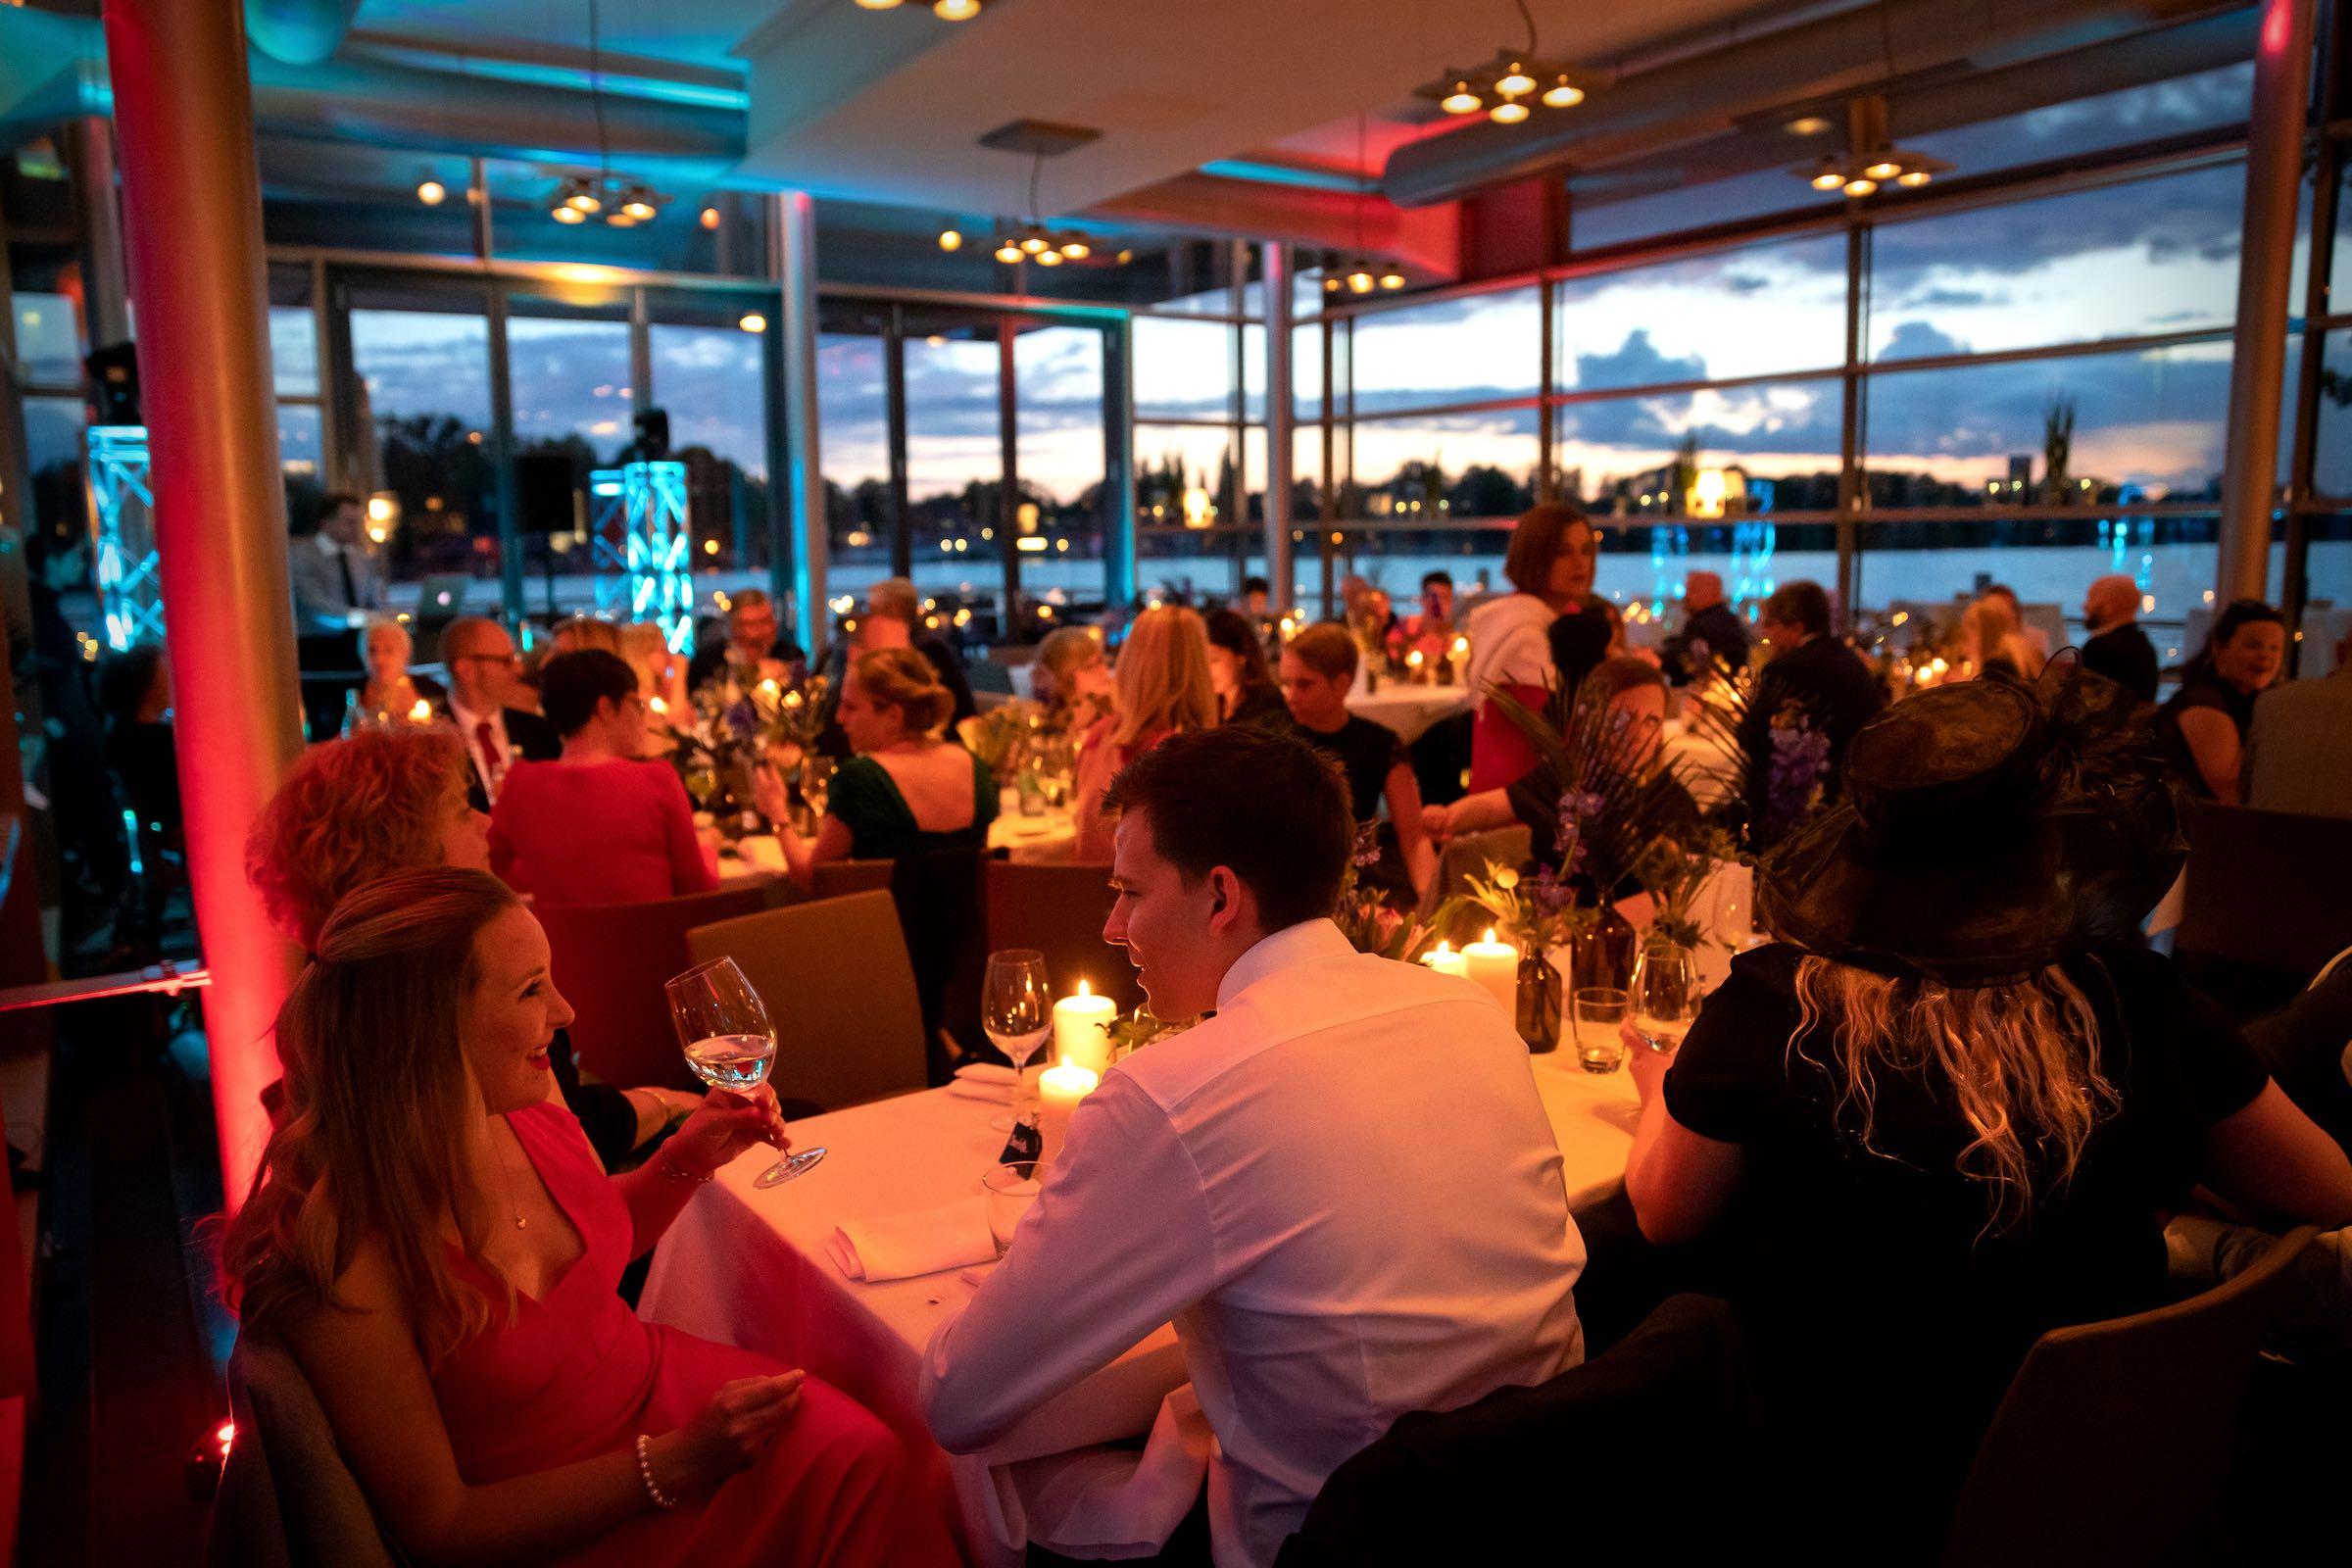 DJ | Hamburg | DJ | Messe | Hochzeits | DJ | Firmenevent | Firmenfeier | DJ | Geburtstag | DJ | Sommerfest | Playlist | Essen | Buchen | Mieten | Hamburgfeiert